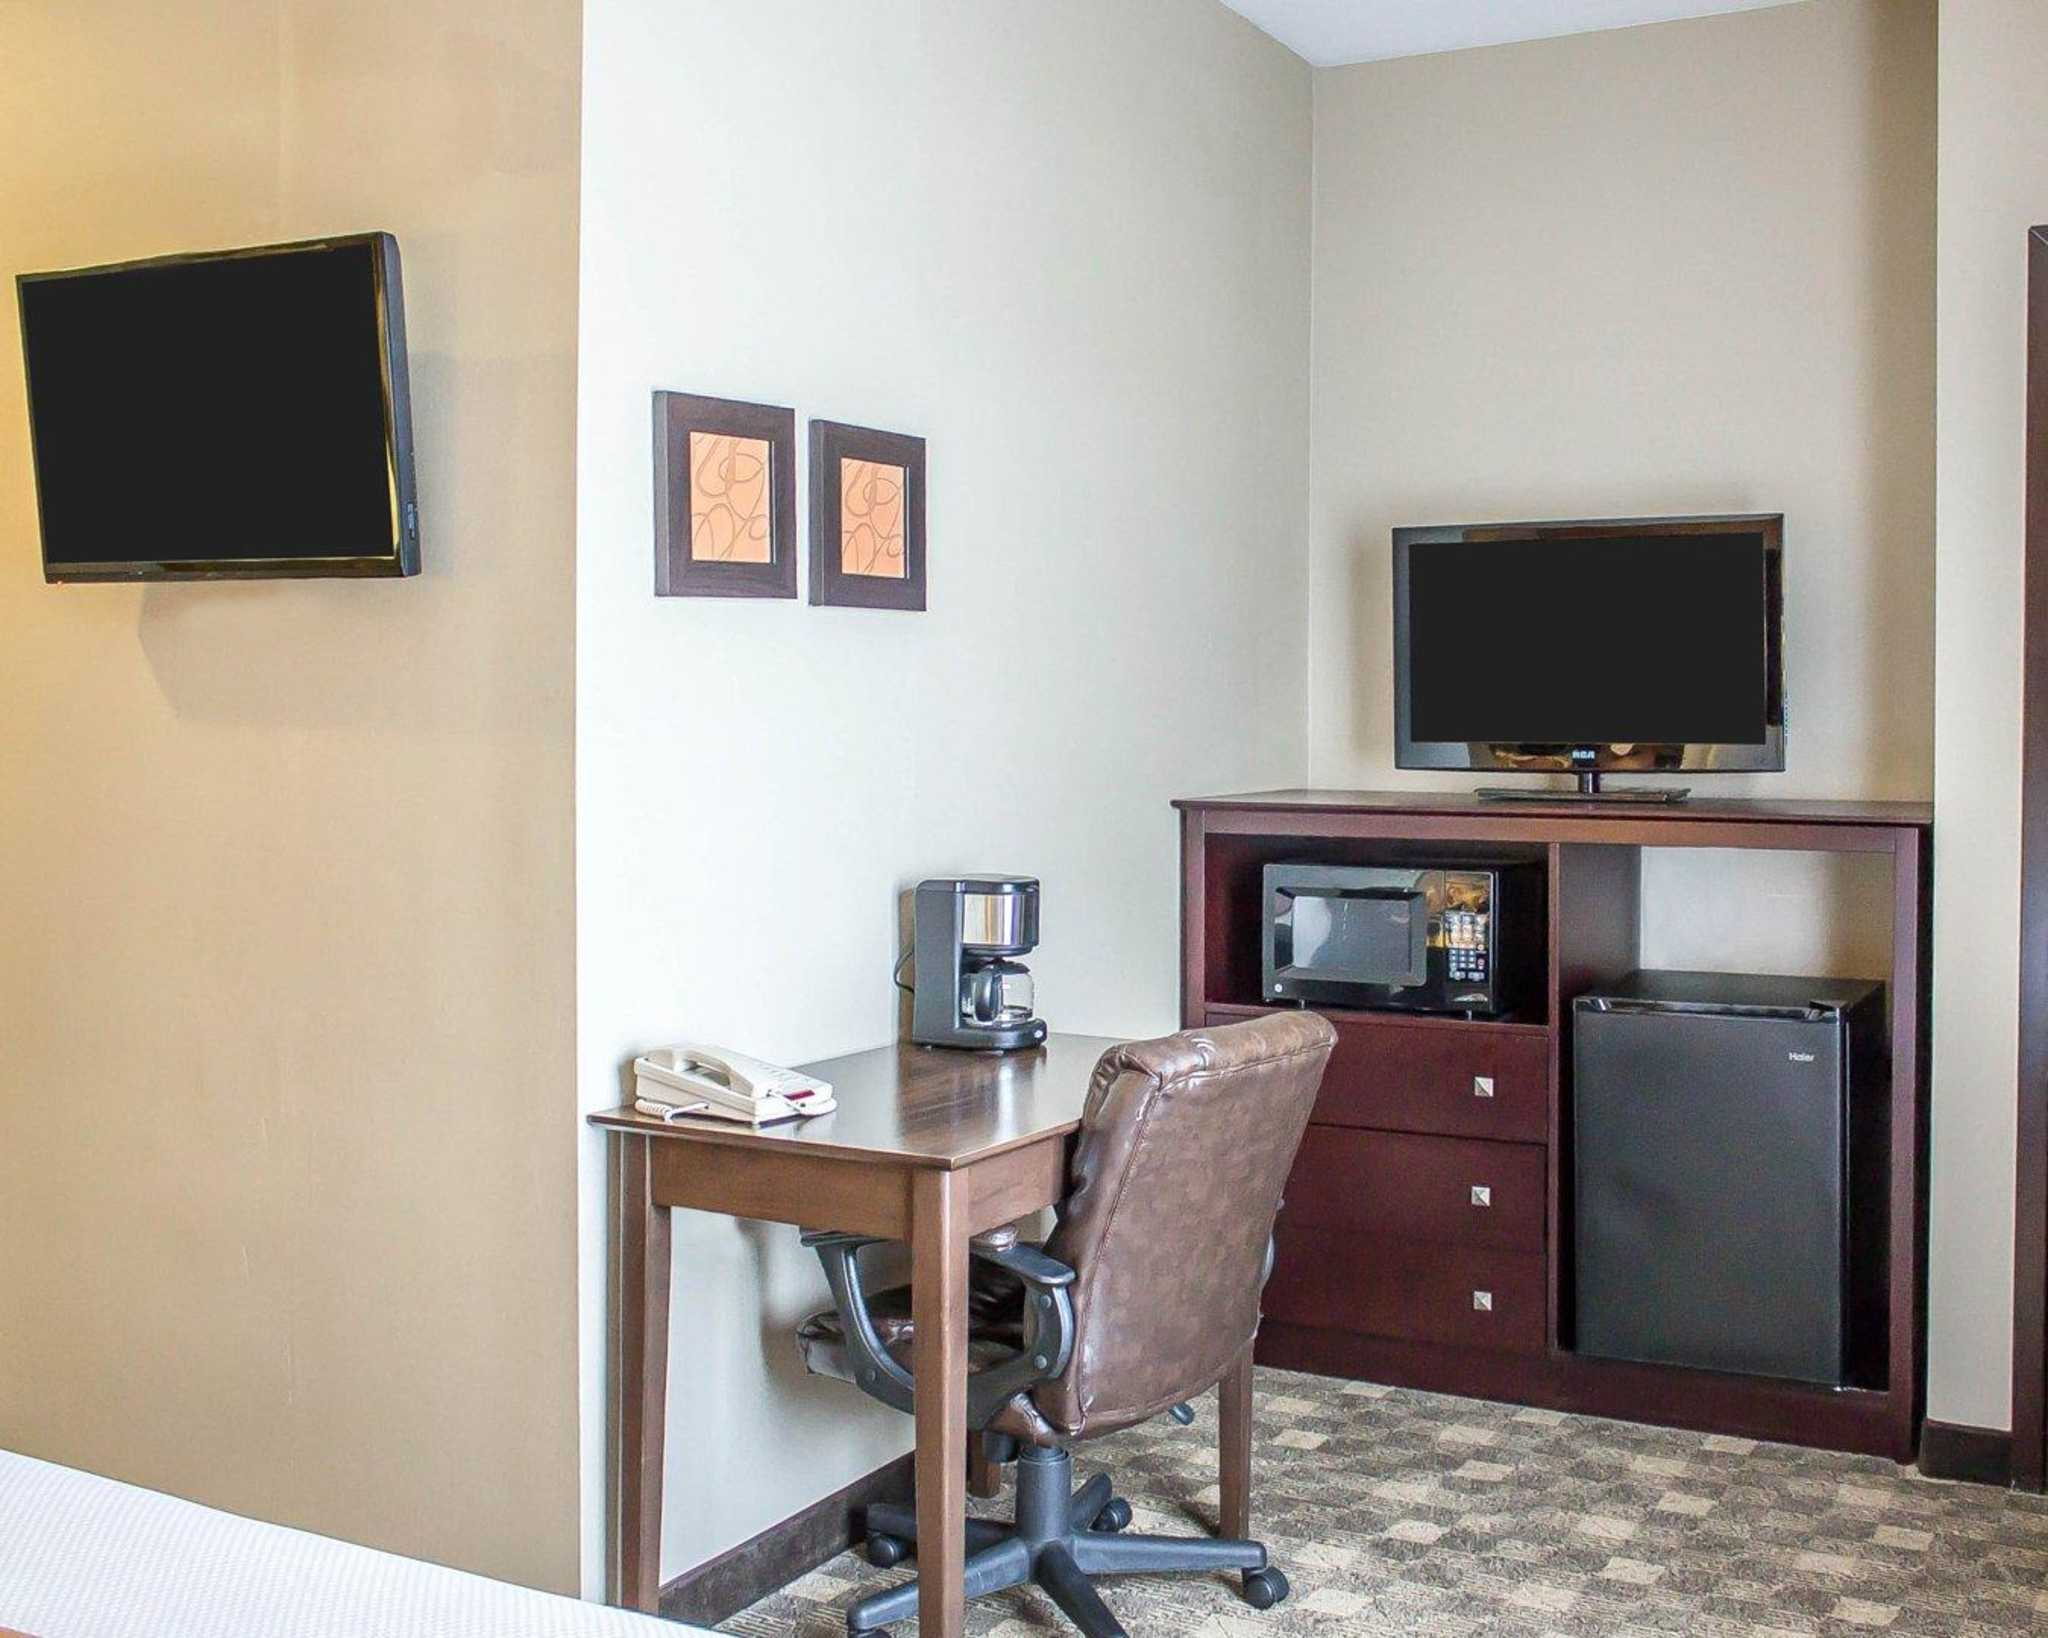 Comfort Suites Perrysburg - Toledo South image 23